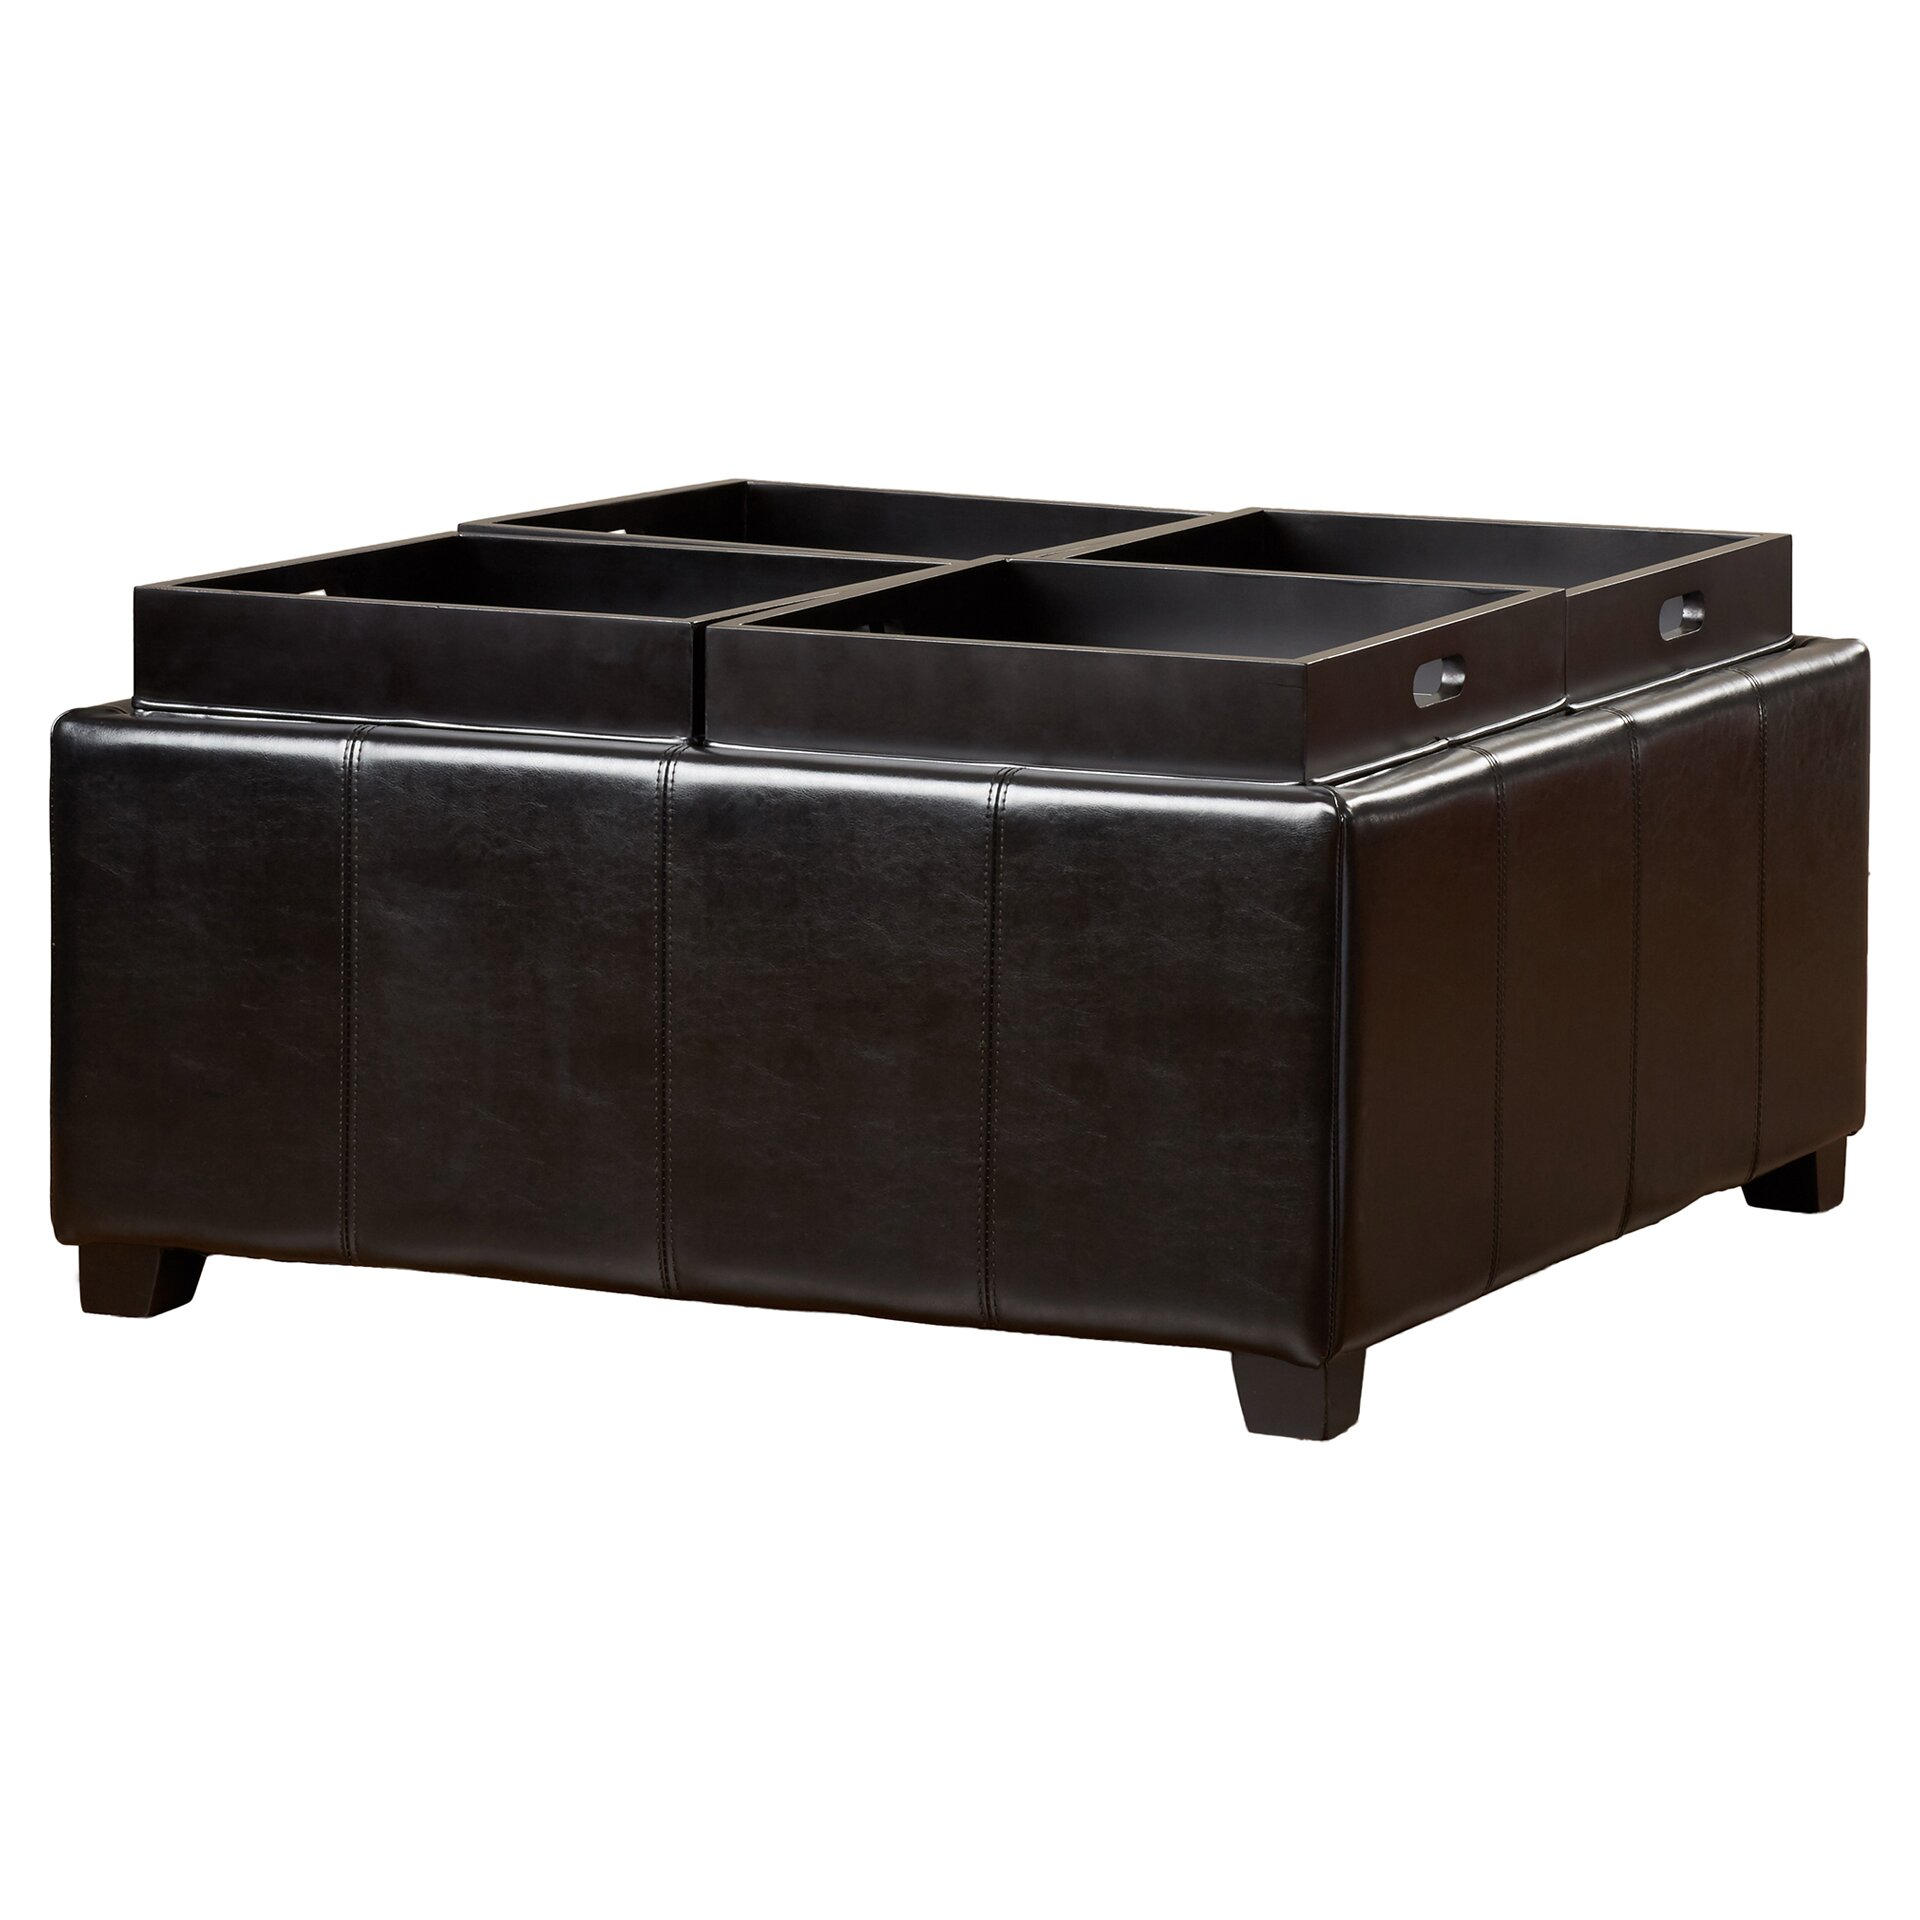 house of hampton dandridge leather tray storage ottoman. Black Bedroom Furniture Sets. Home Design Ideas